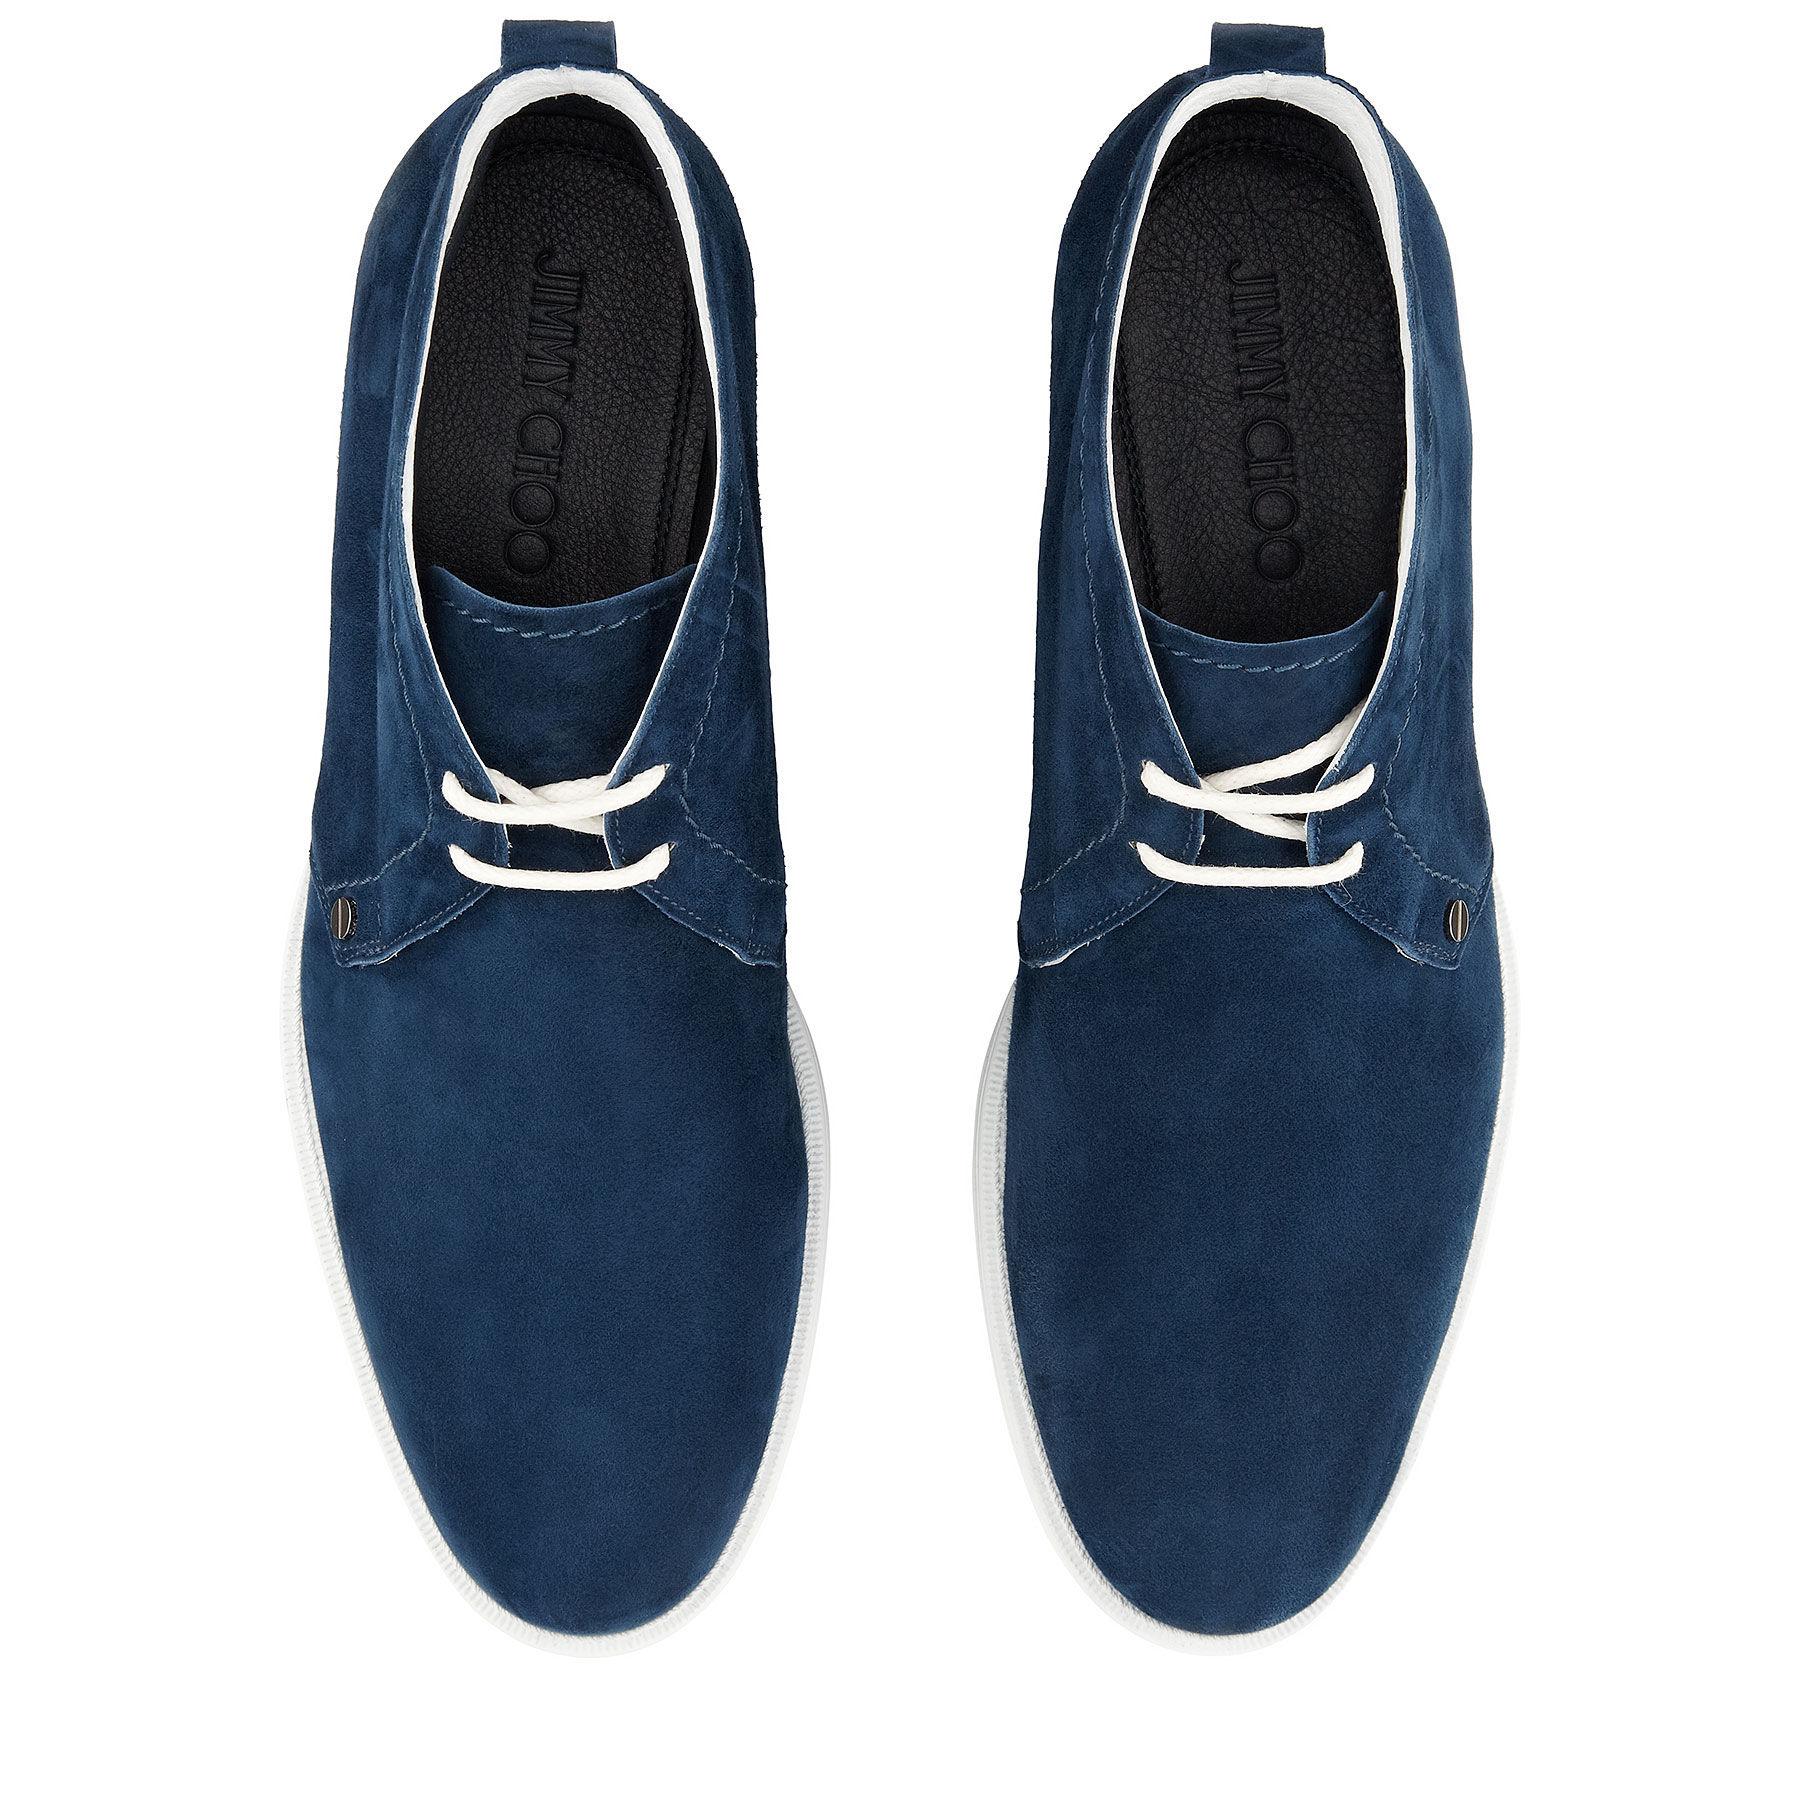 Jimmy Choo Dunraven in Navy (Blue) for Men